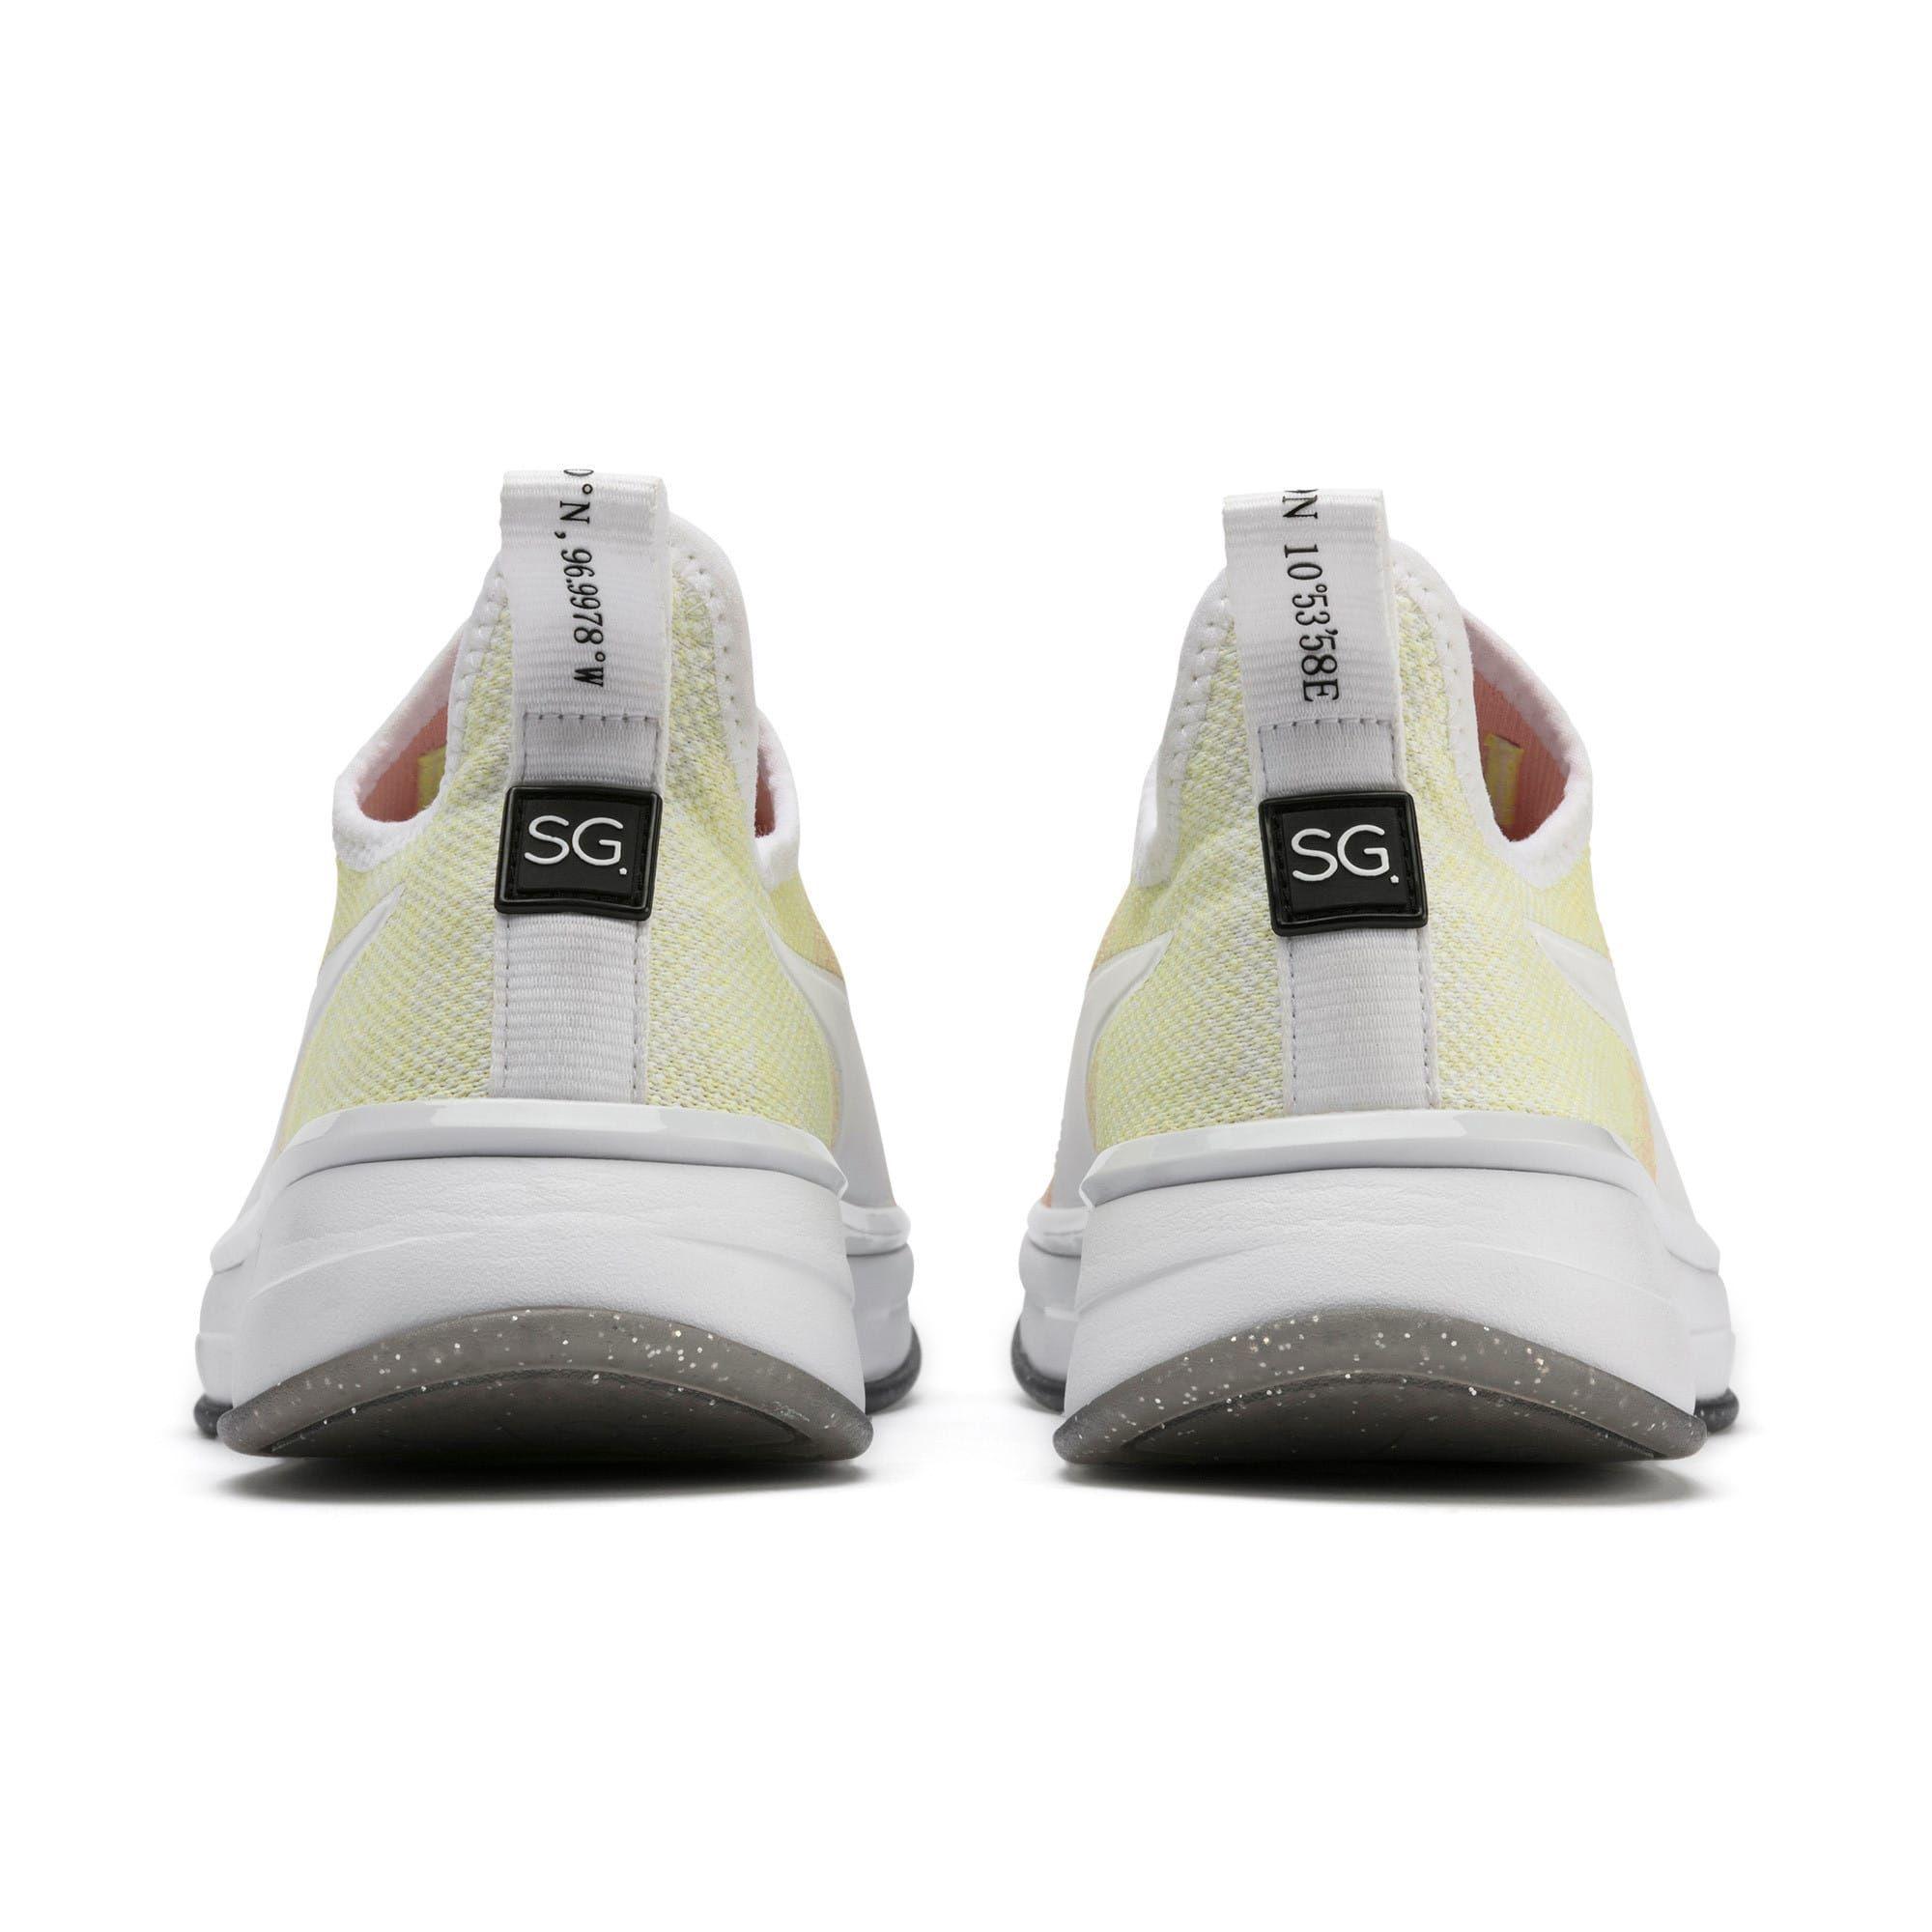 PUMA x SELENA GOMEZ Slip On Gradient Women's Training Shoes